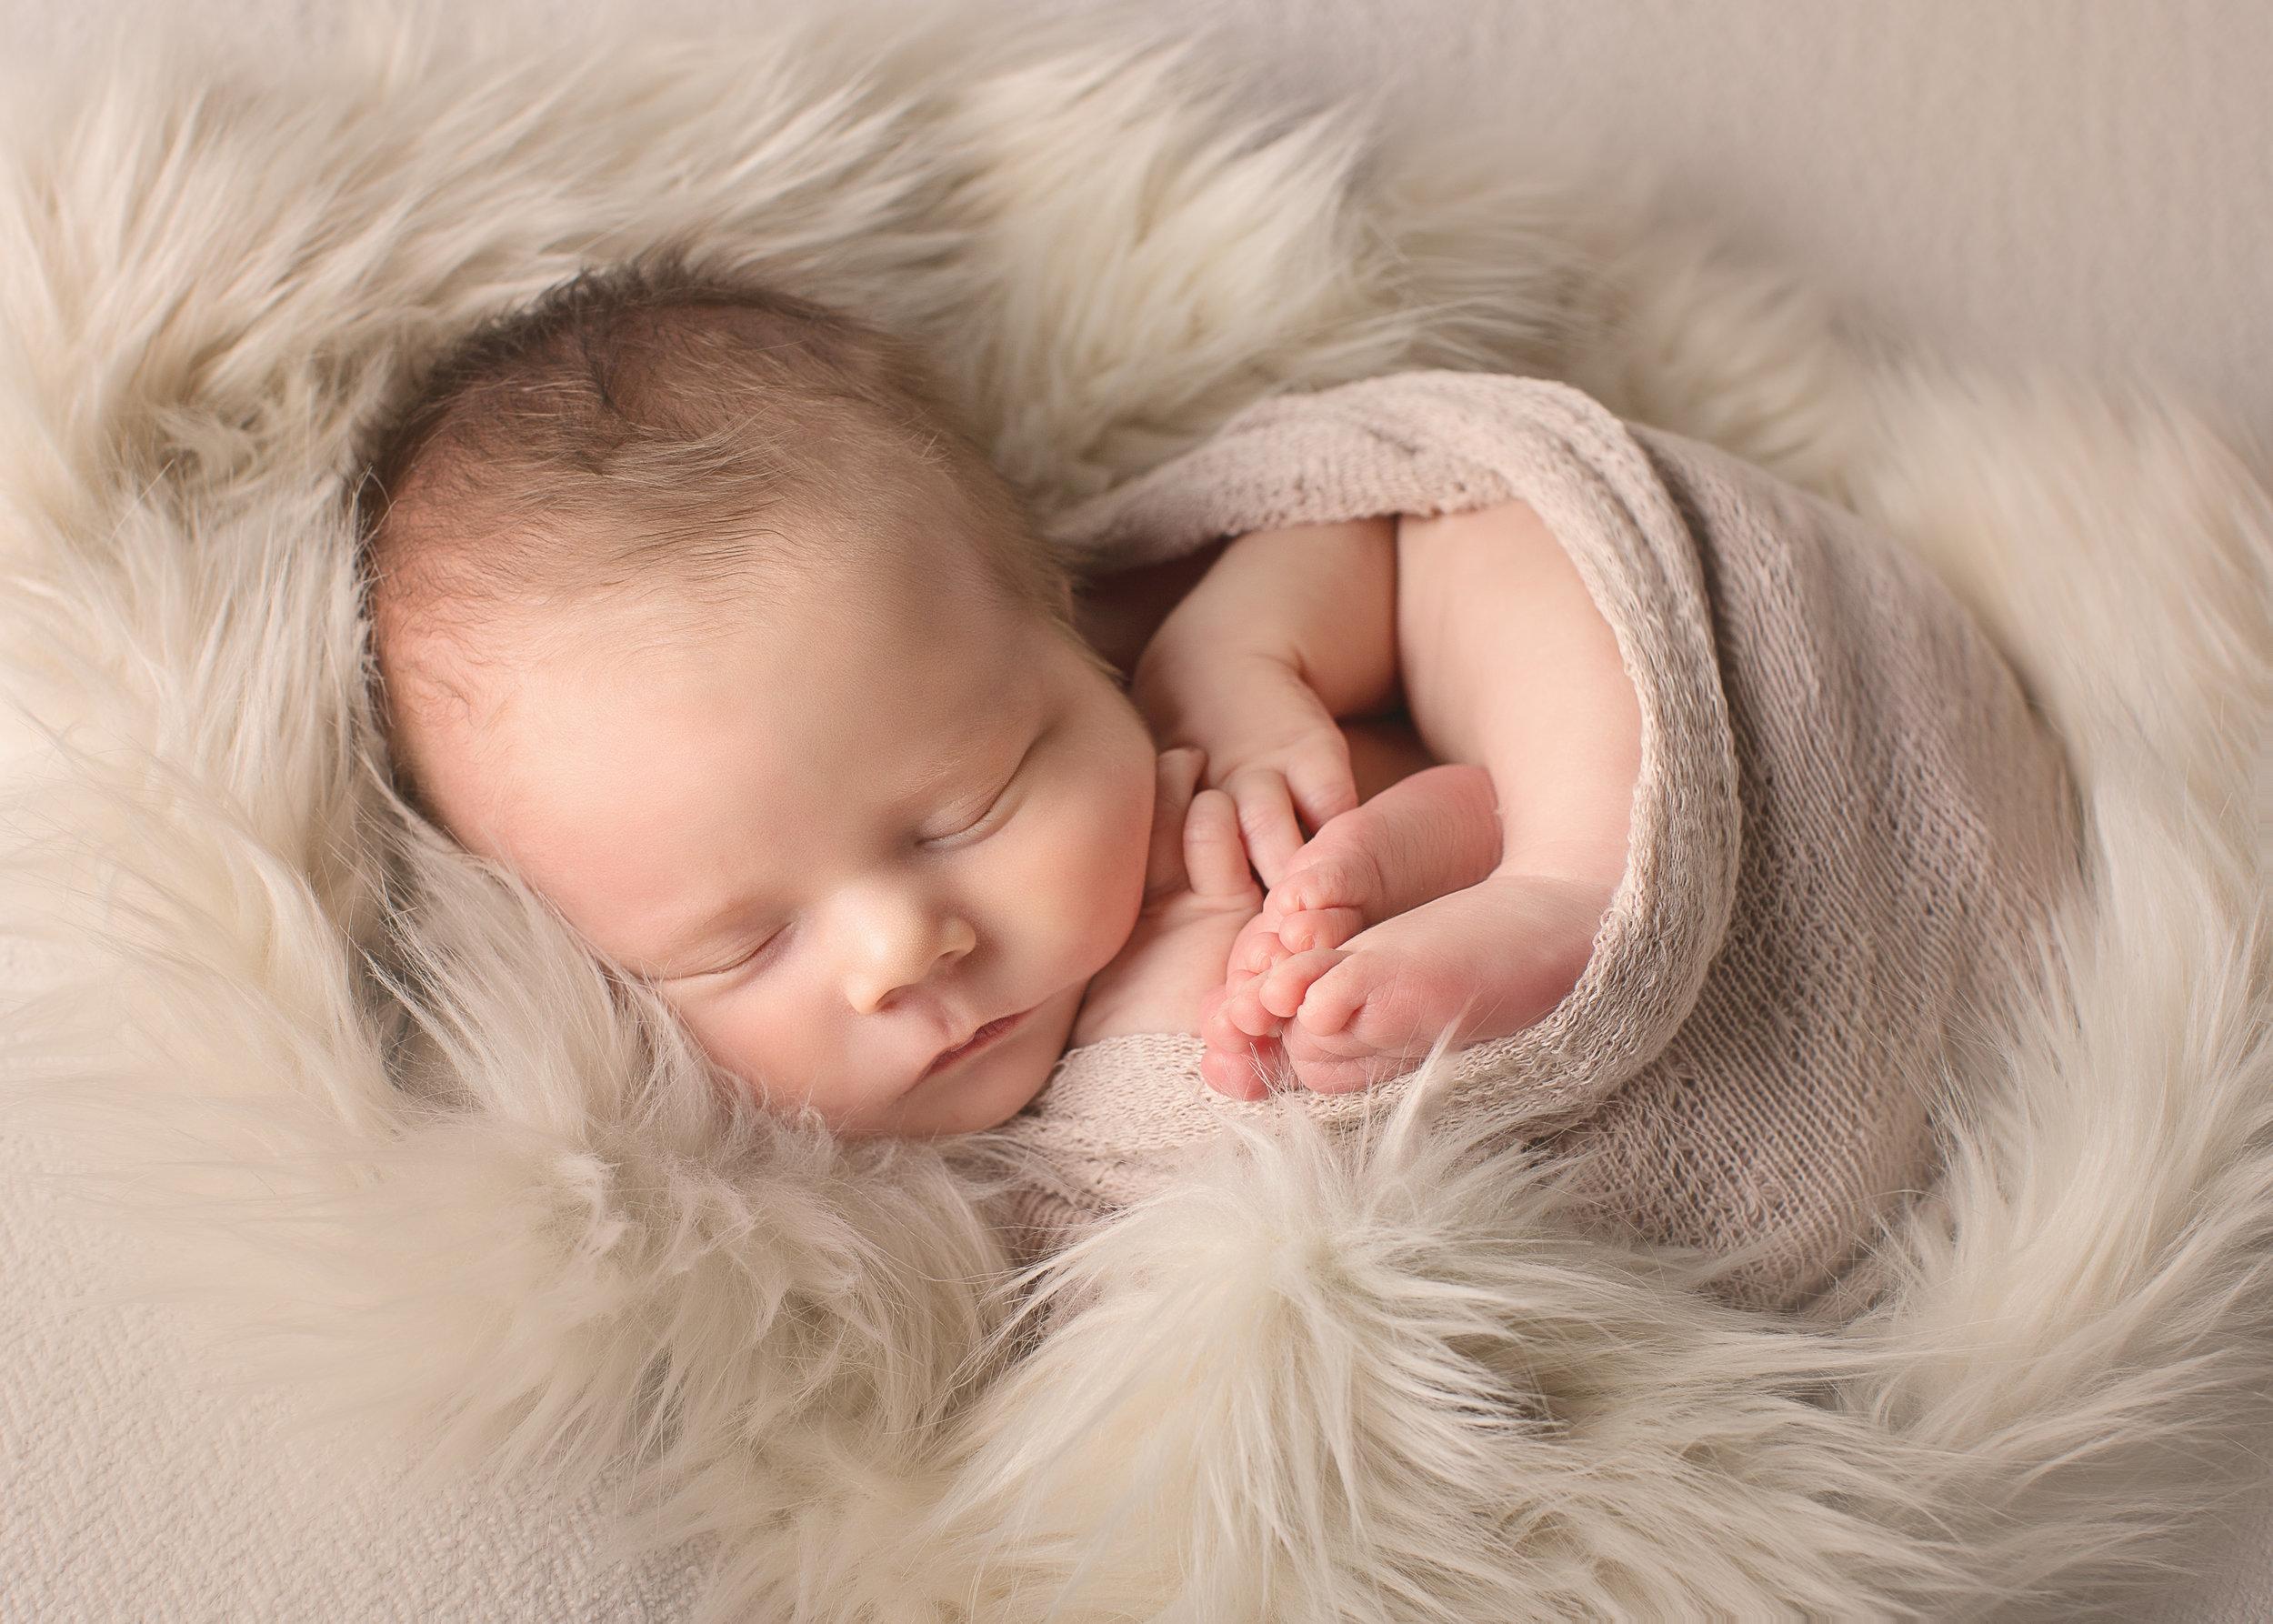 millbury_newborn_photographer_massachusetts_boston_baby_boy_photos7.jpg